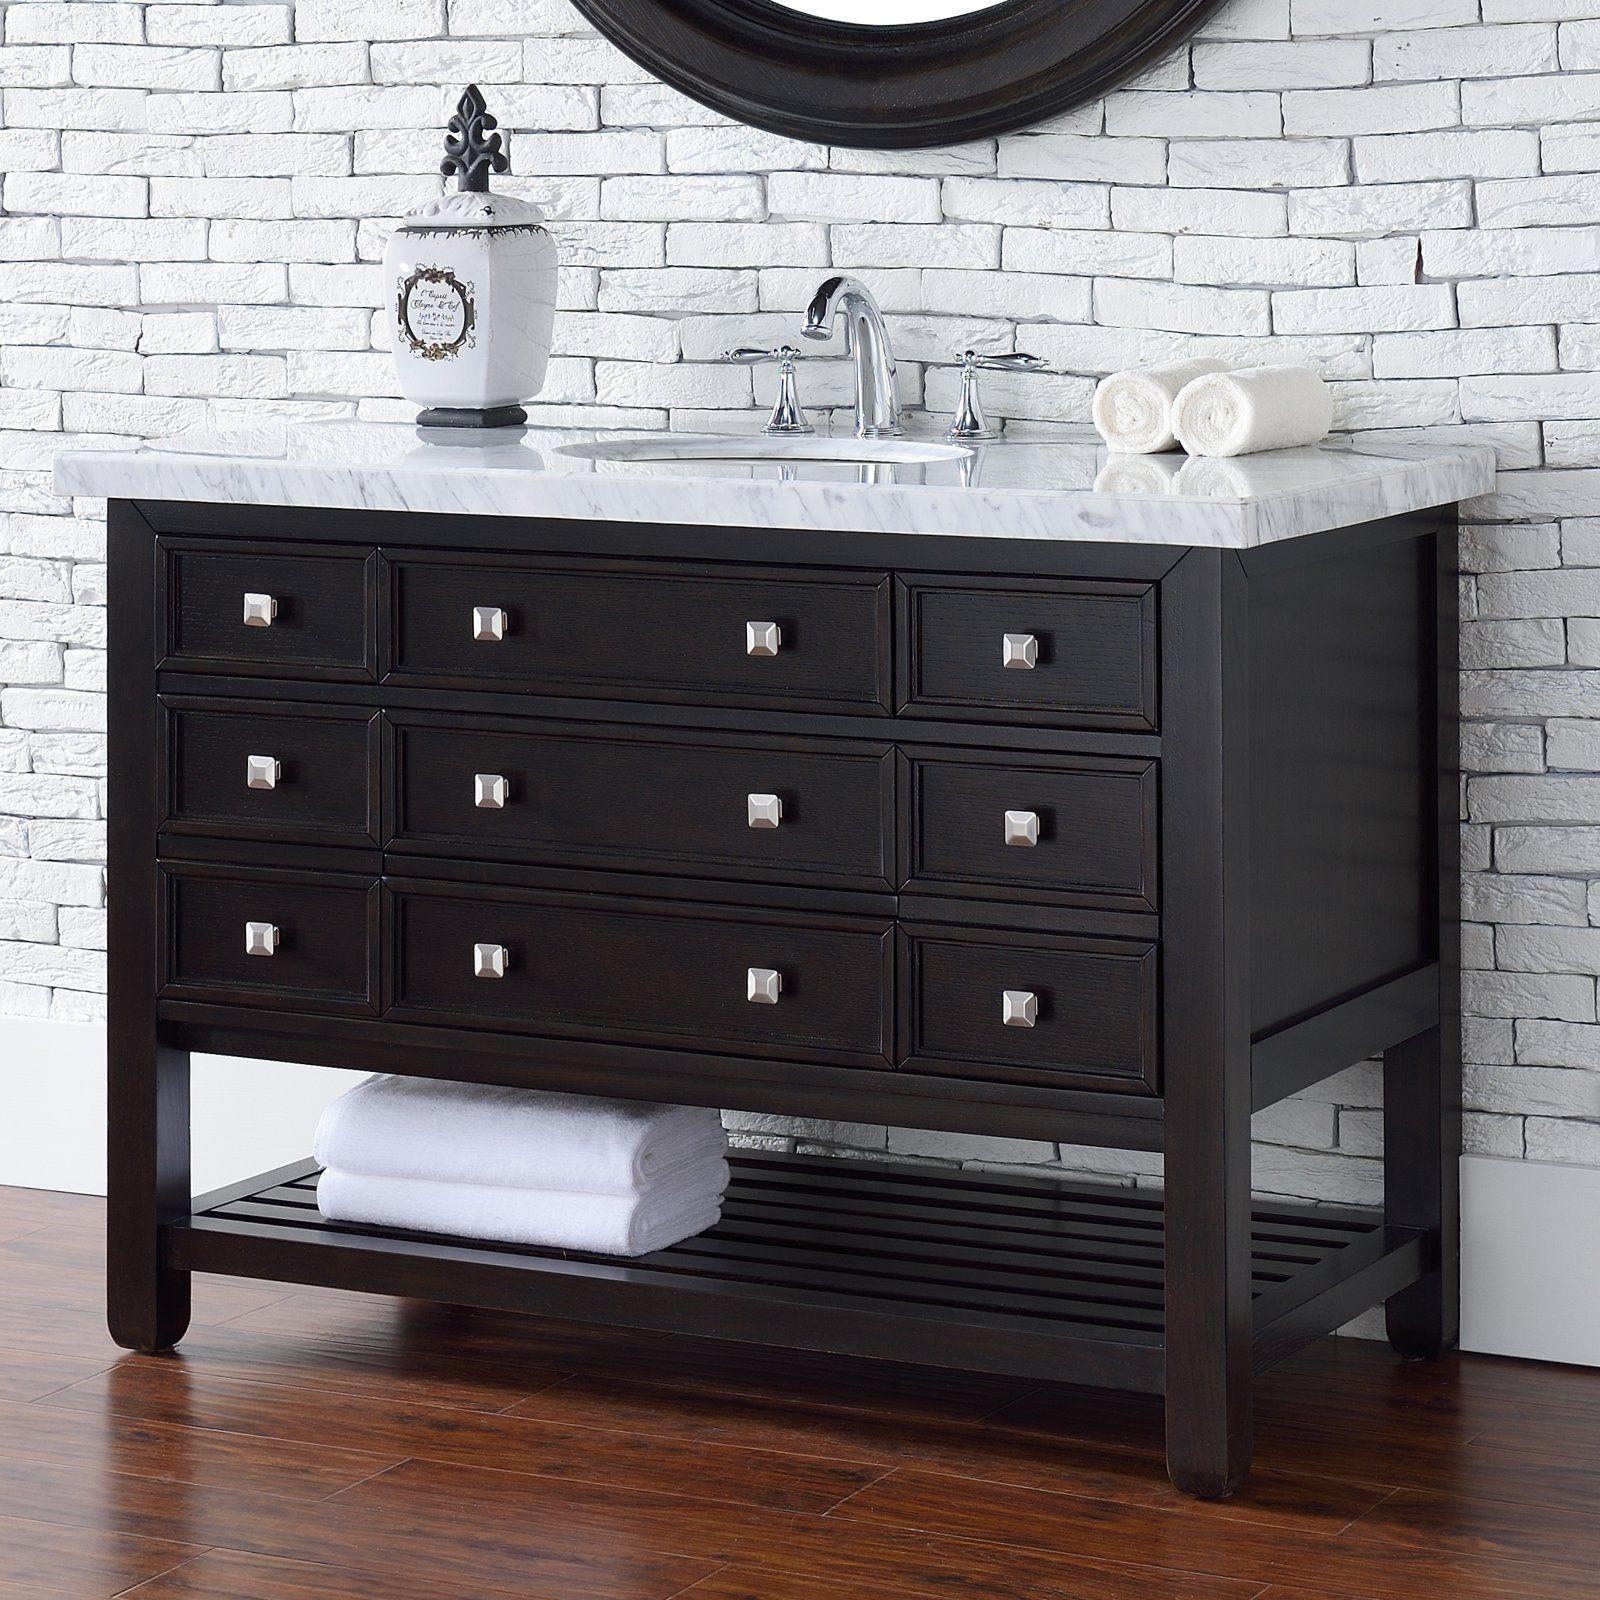 James Martin Vancouver 45 5 In Single Bathroom Vanity From Hayneedle